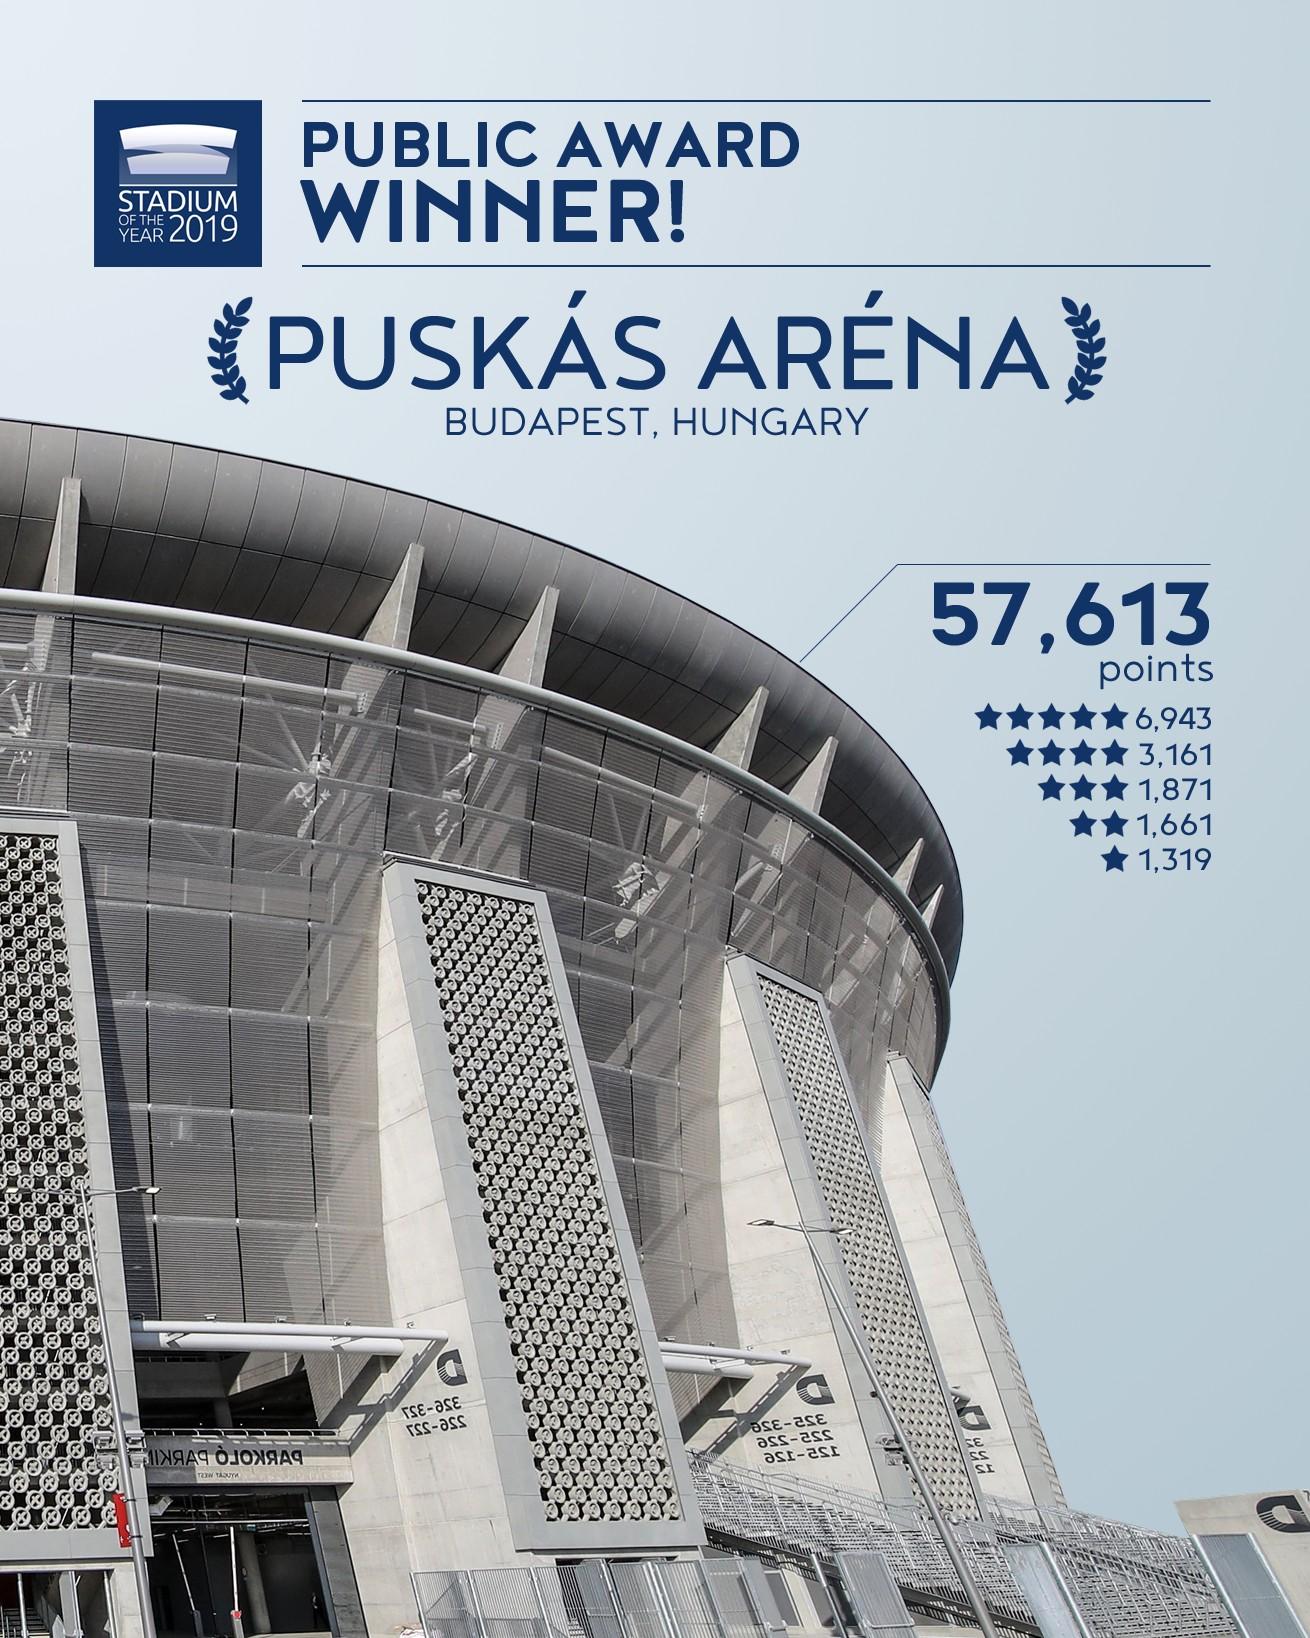 Stadium of the Year 2019